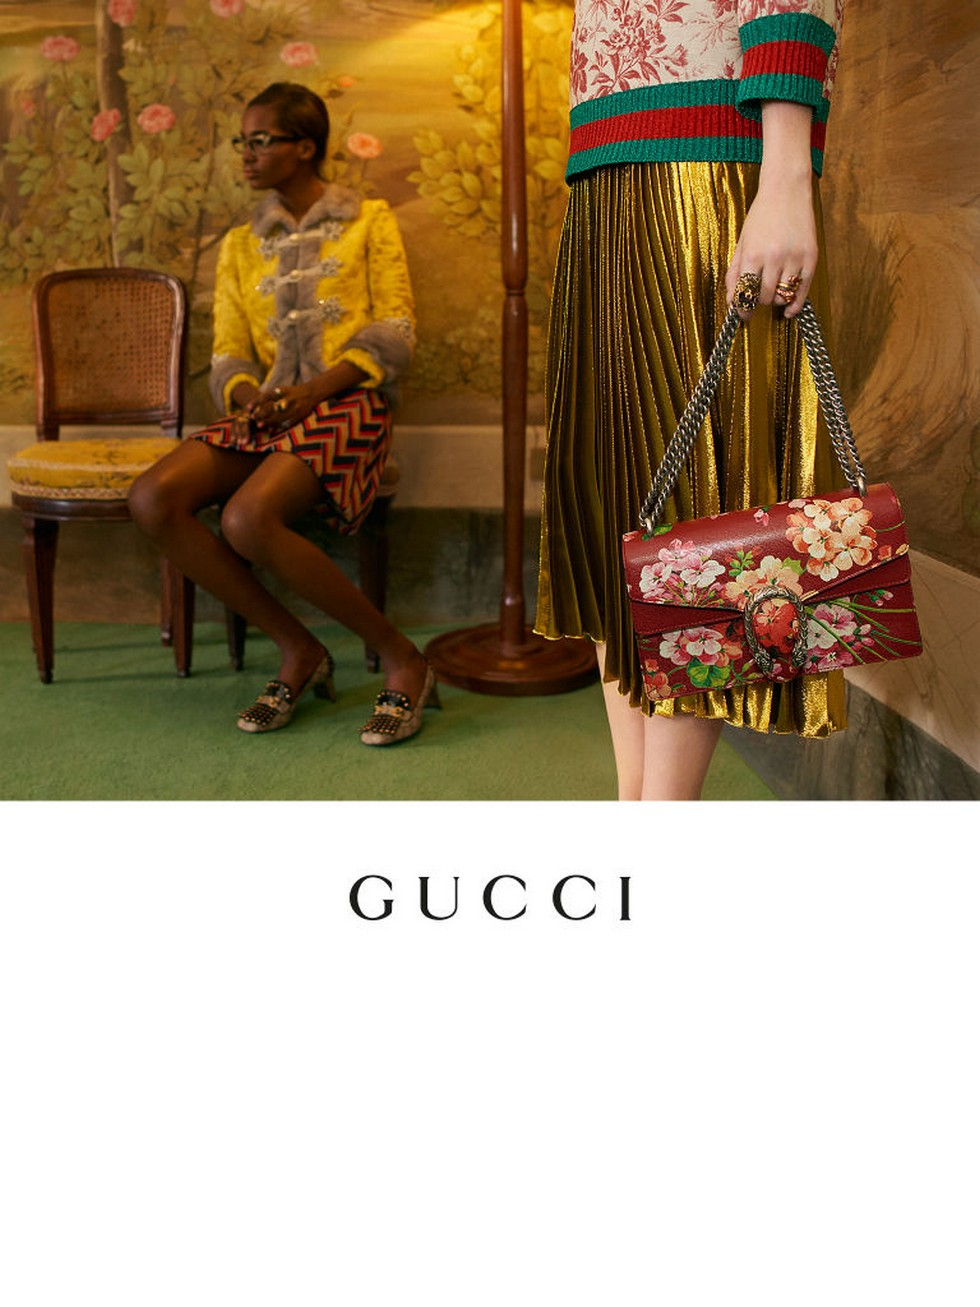 Milan Fashion Boutiques Gucci unveils new store concept (5) Milan Fashion Boutiques: Gucci unveils new store concept Milan Fashion Boutiques: Gucci unveils new store concept Milan Fashion Boutiques Gucci unveils new store concept 5